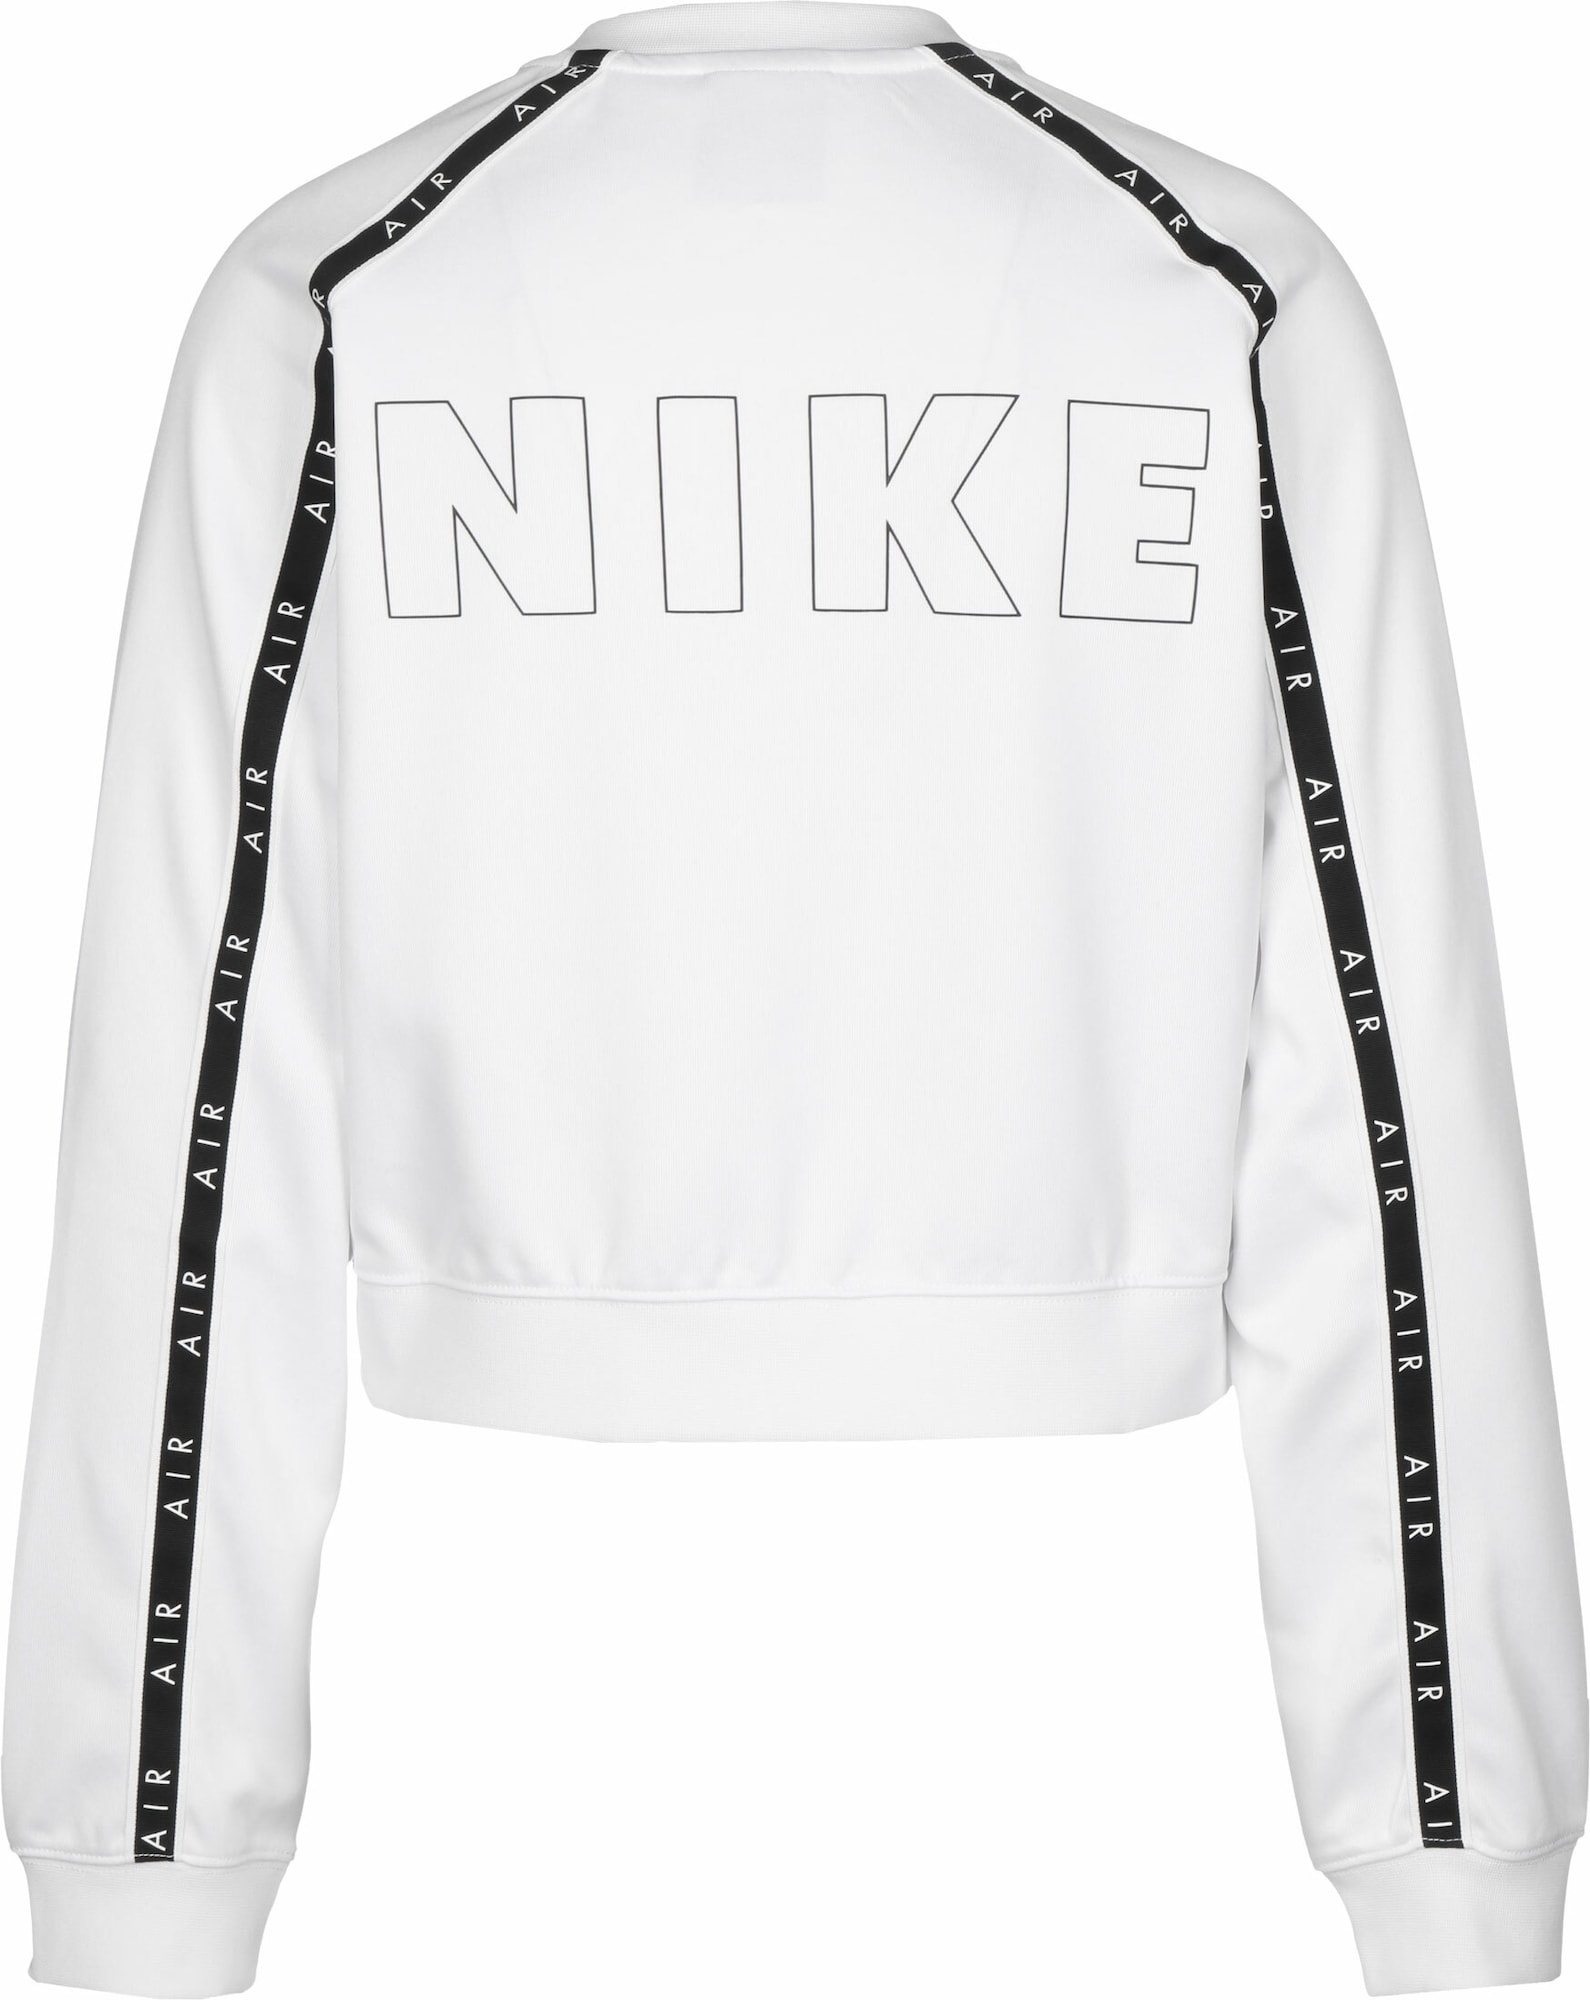 nike sportswear - Trainingsjacke 'Air'